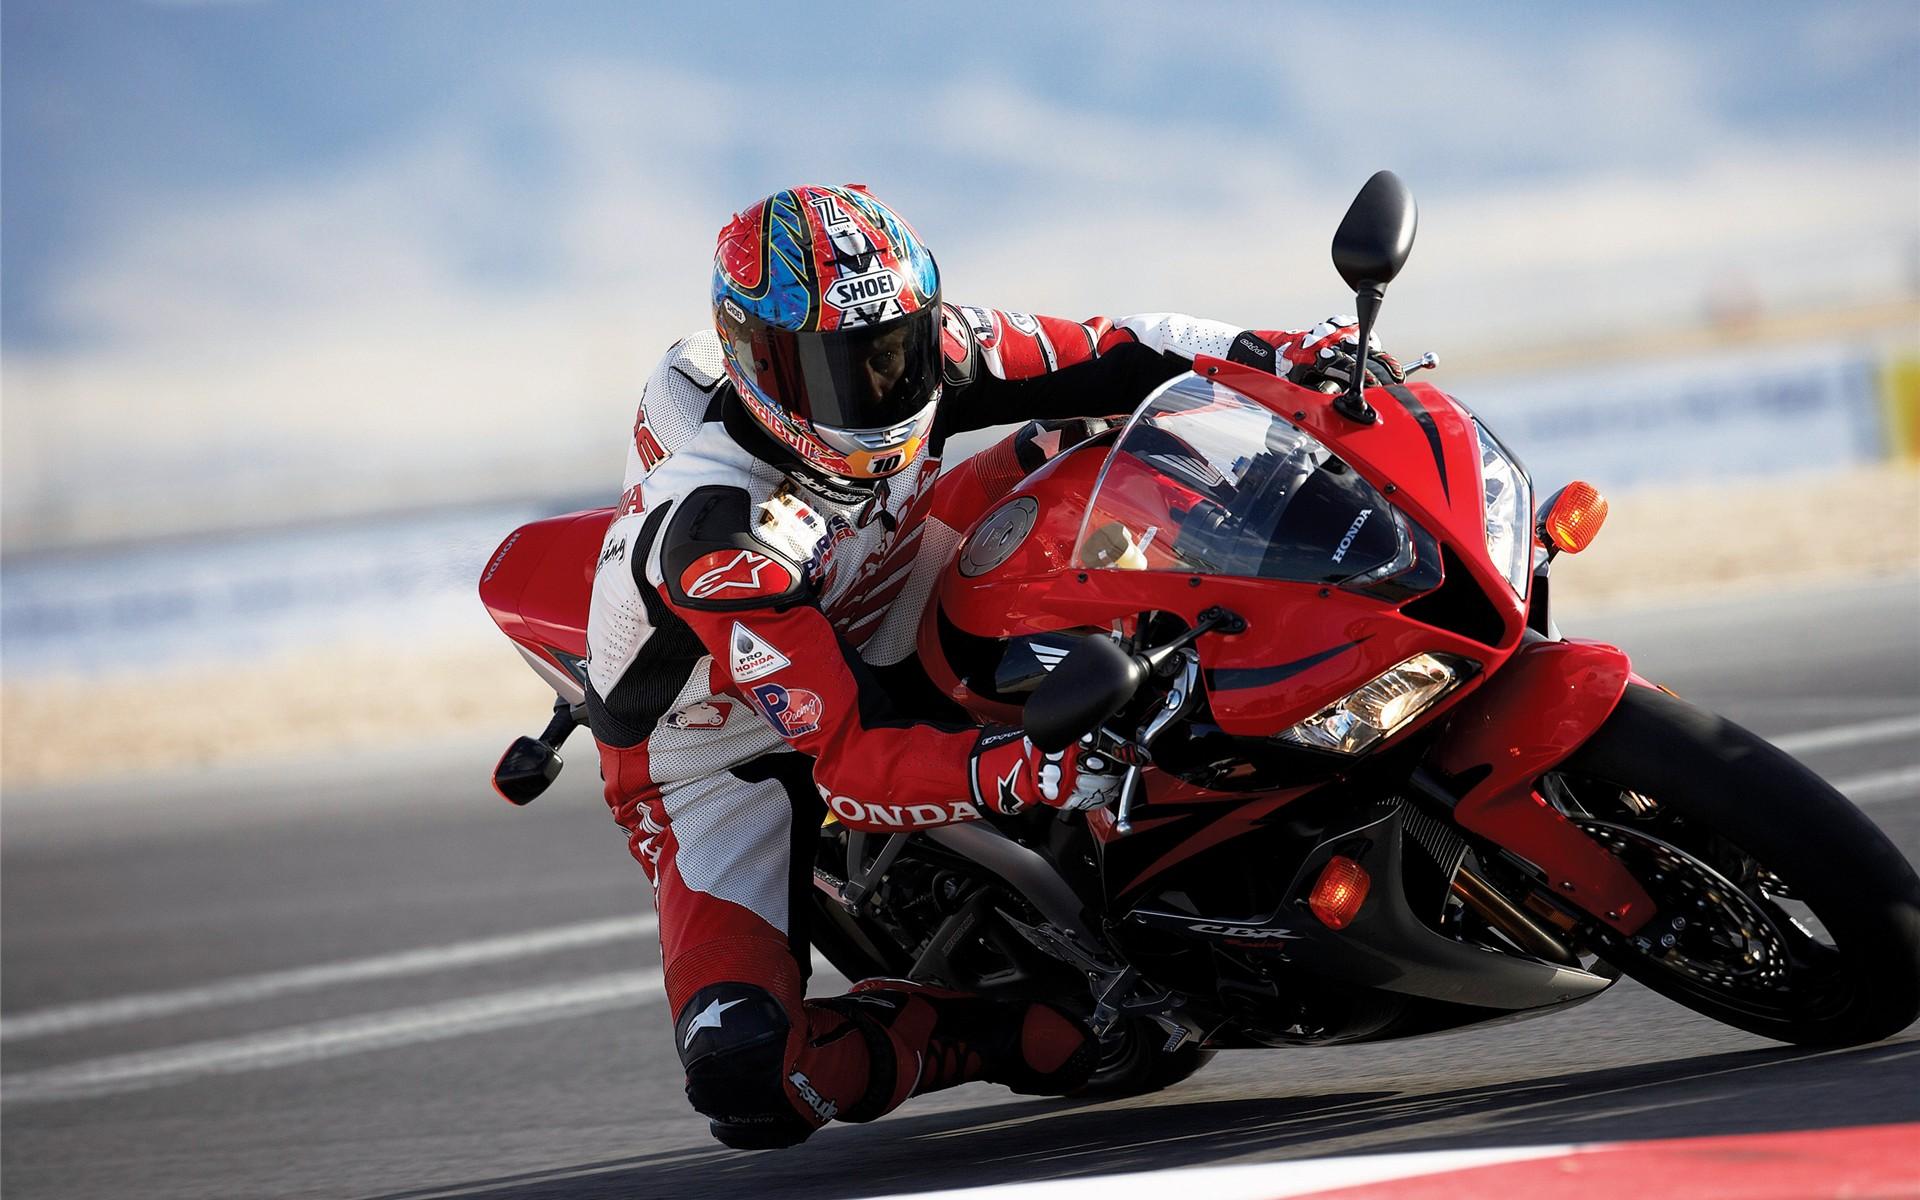 Honda Motorcycle Cbrrr Sportbike Free 448952 Wallpaper